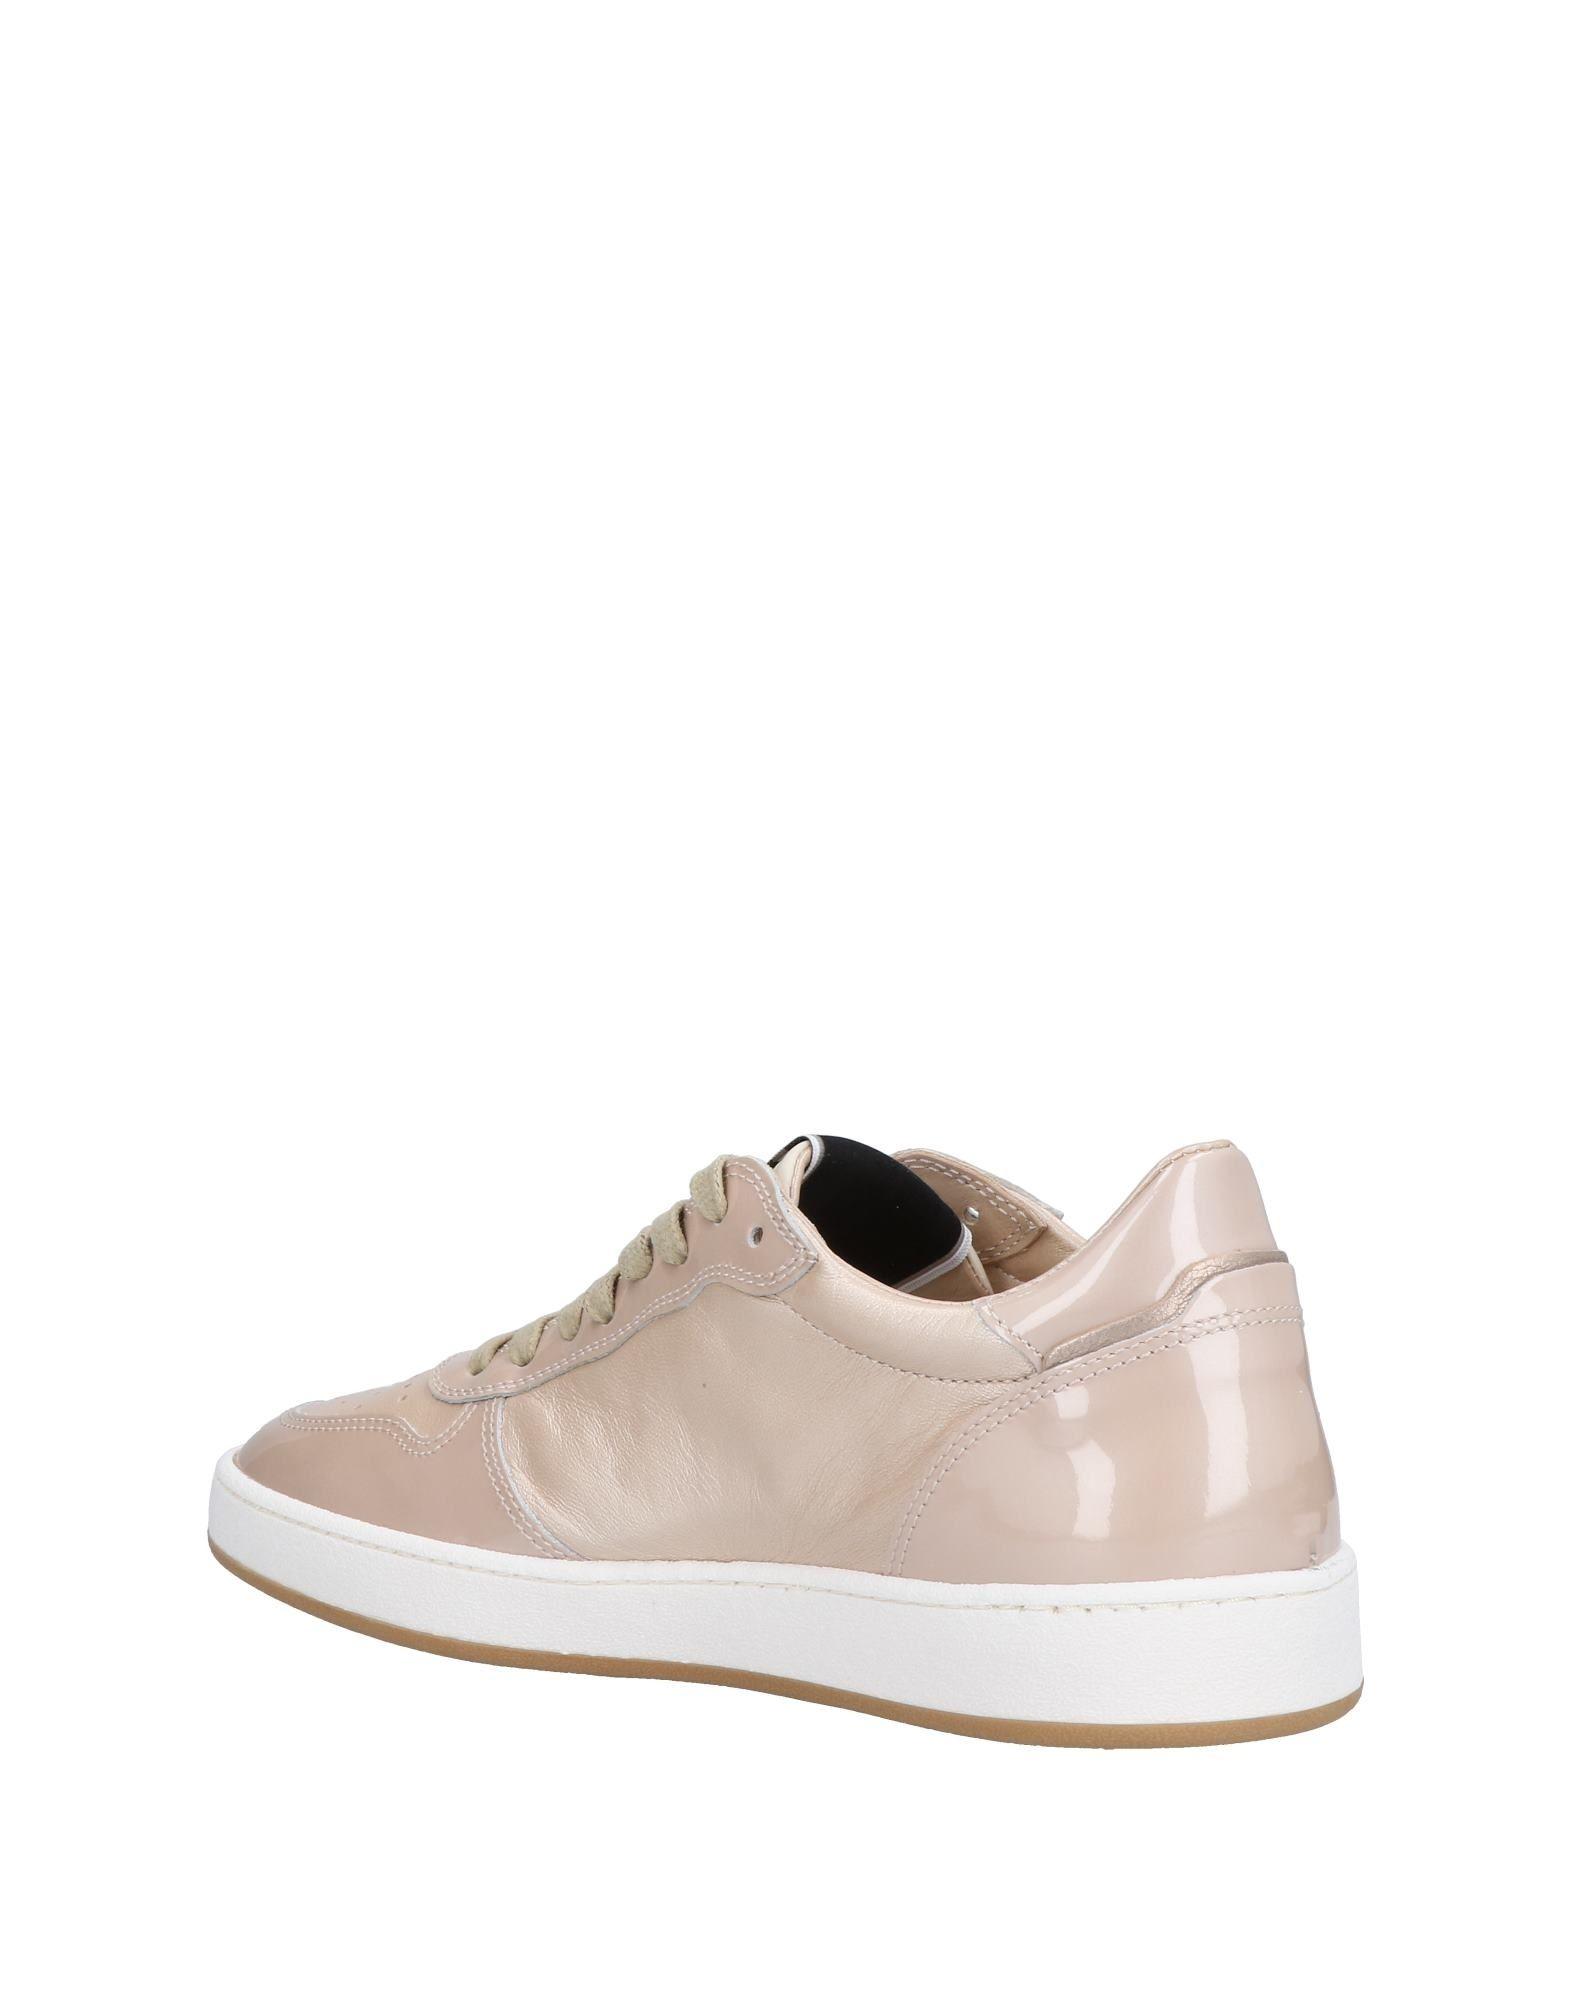 Stilvolle billige Schuhe Damen Philippe Model Sneakers Damen Schuhe  11478644AT 985a5b